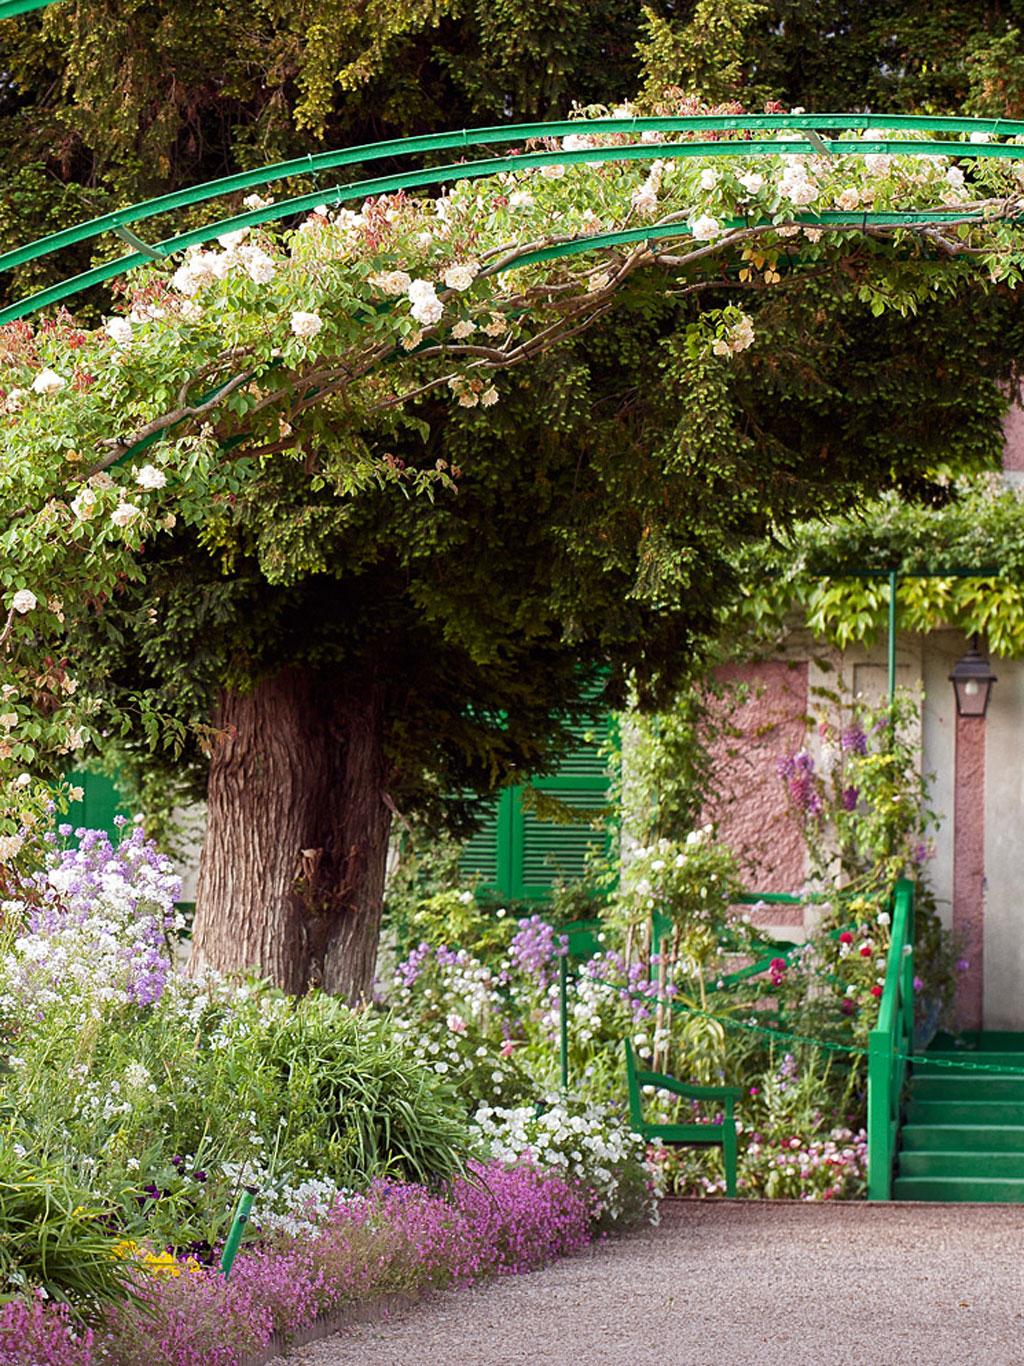 Visita guida pelo mágico jardim de Giverny, de Monet